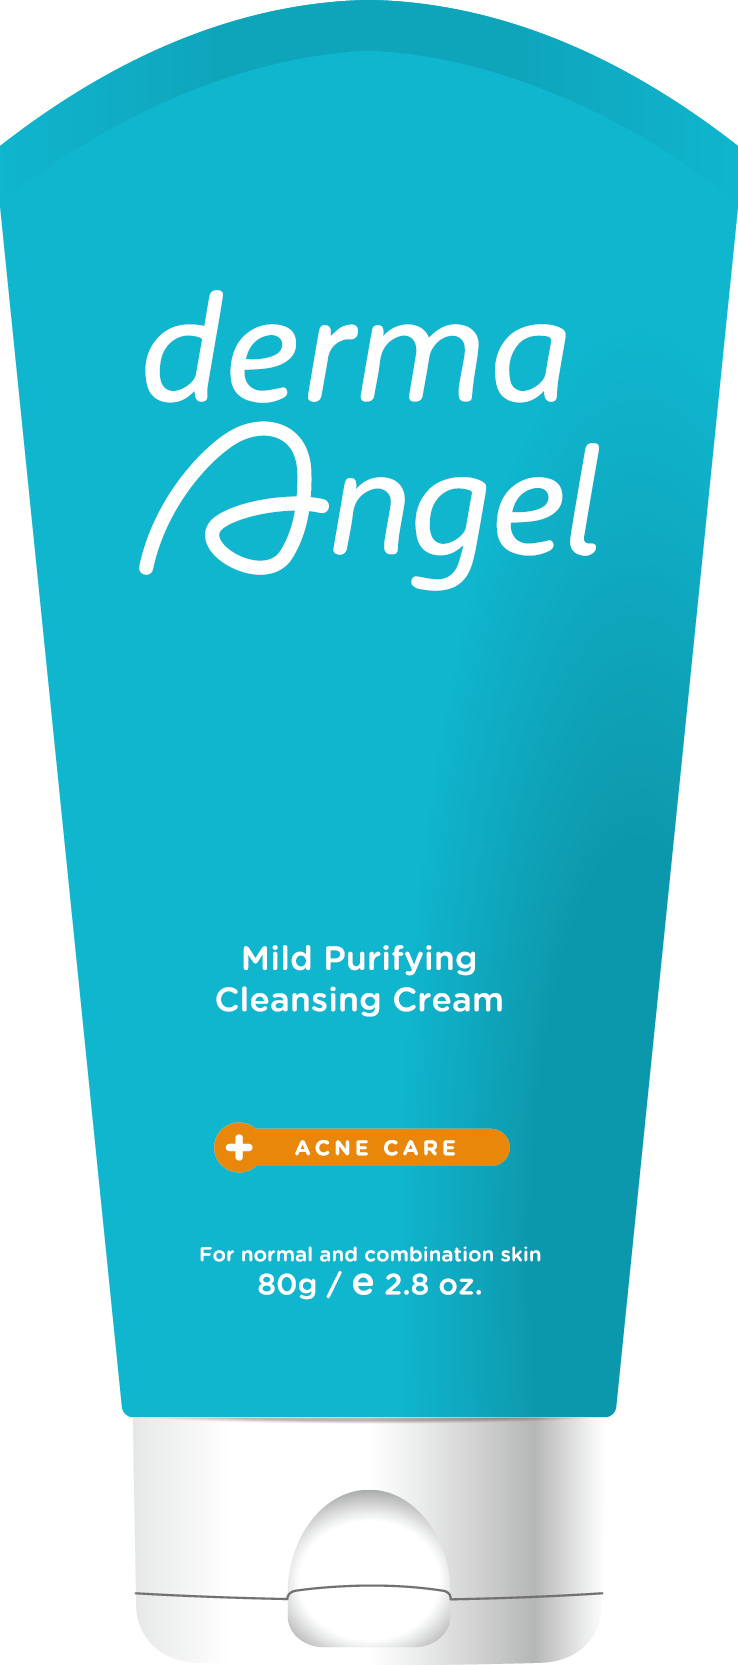 DermaAngel Acne Care Mild Purifying Cleansing Cream / BenQ Materials Corp.